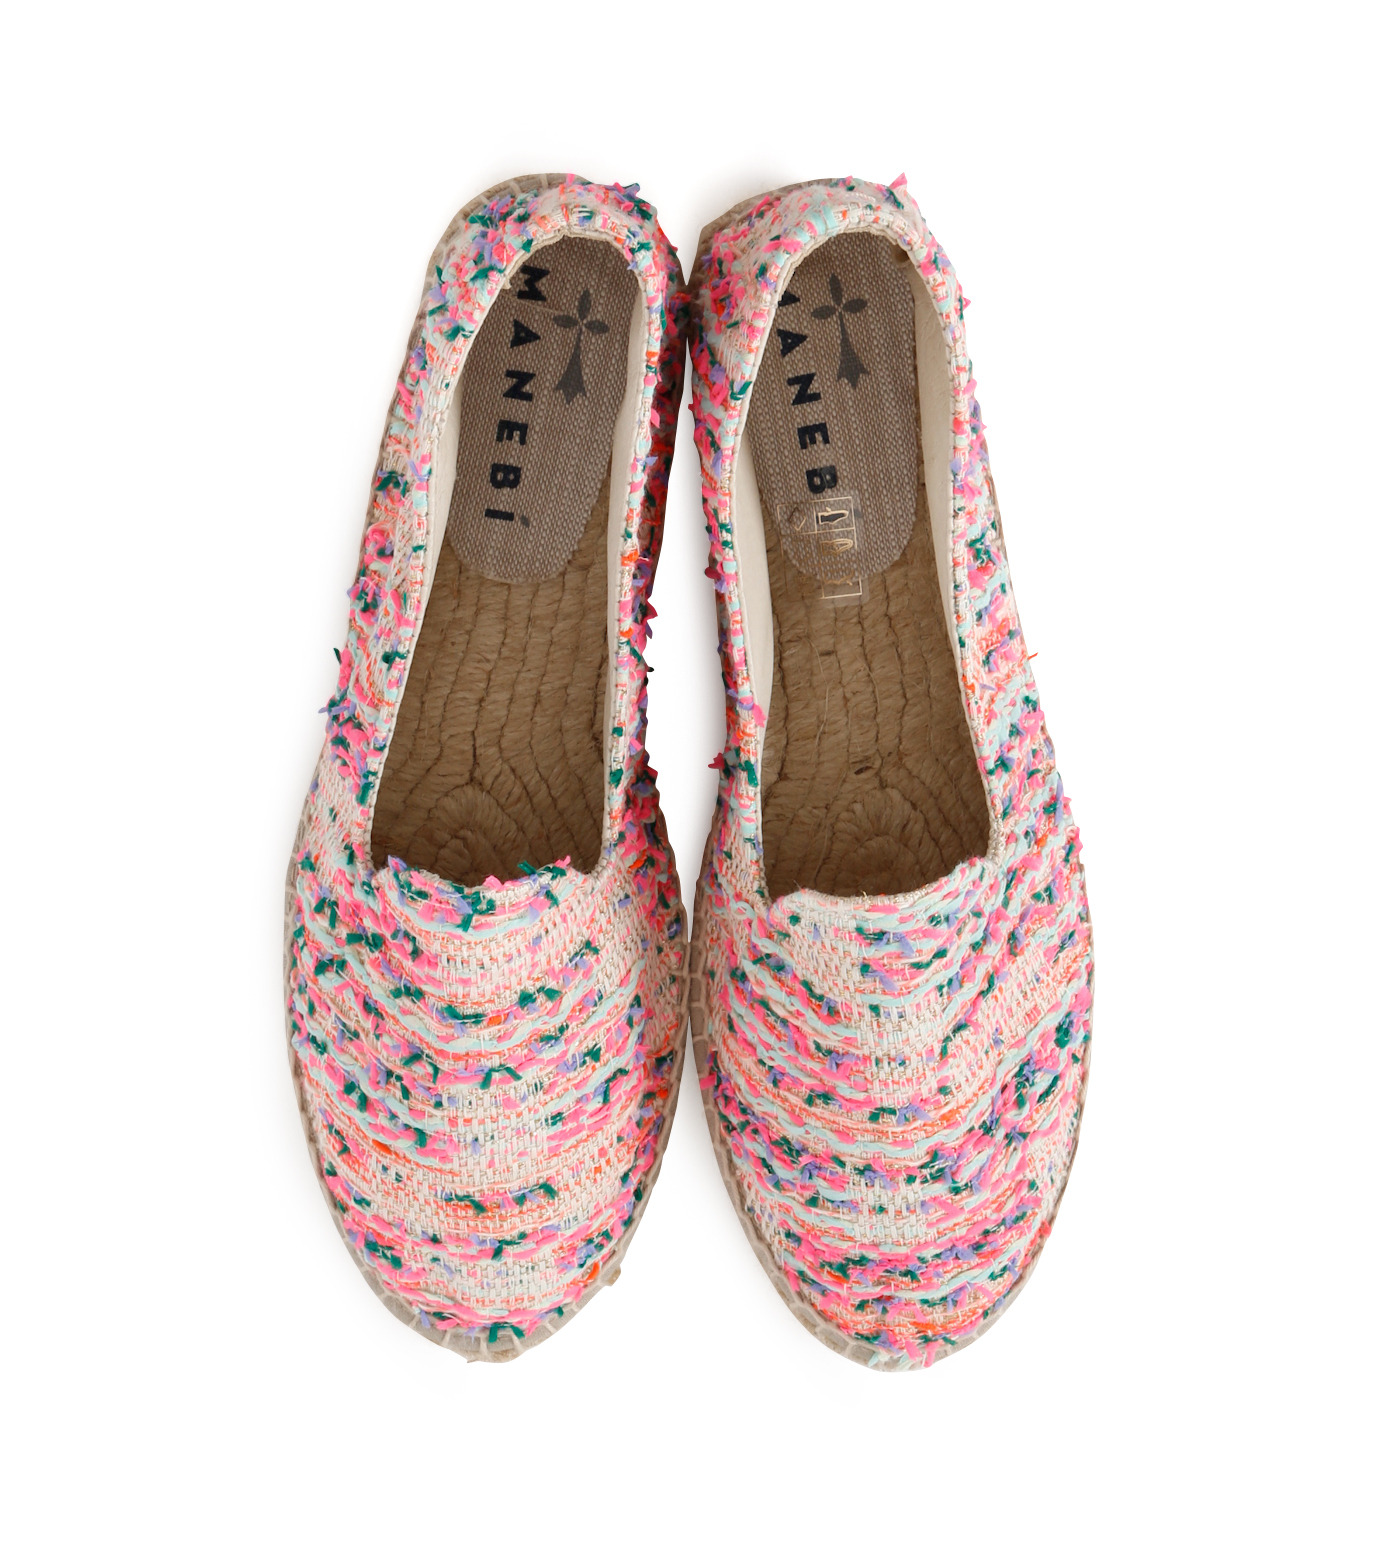 Manebi(マネビ)のneon tweed slippers-NEON PINK(シューズ/shoes)-V-4-3-N-70 拡大詳細画像4